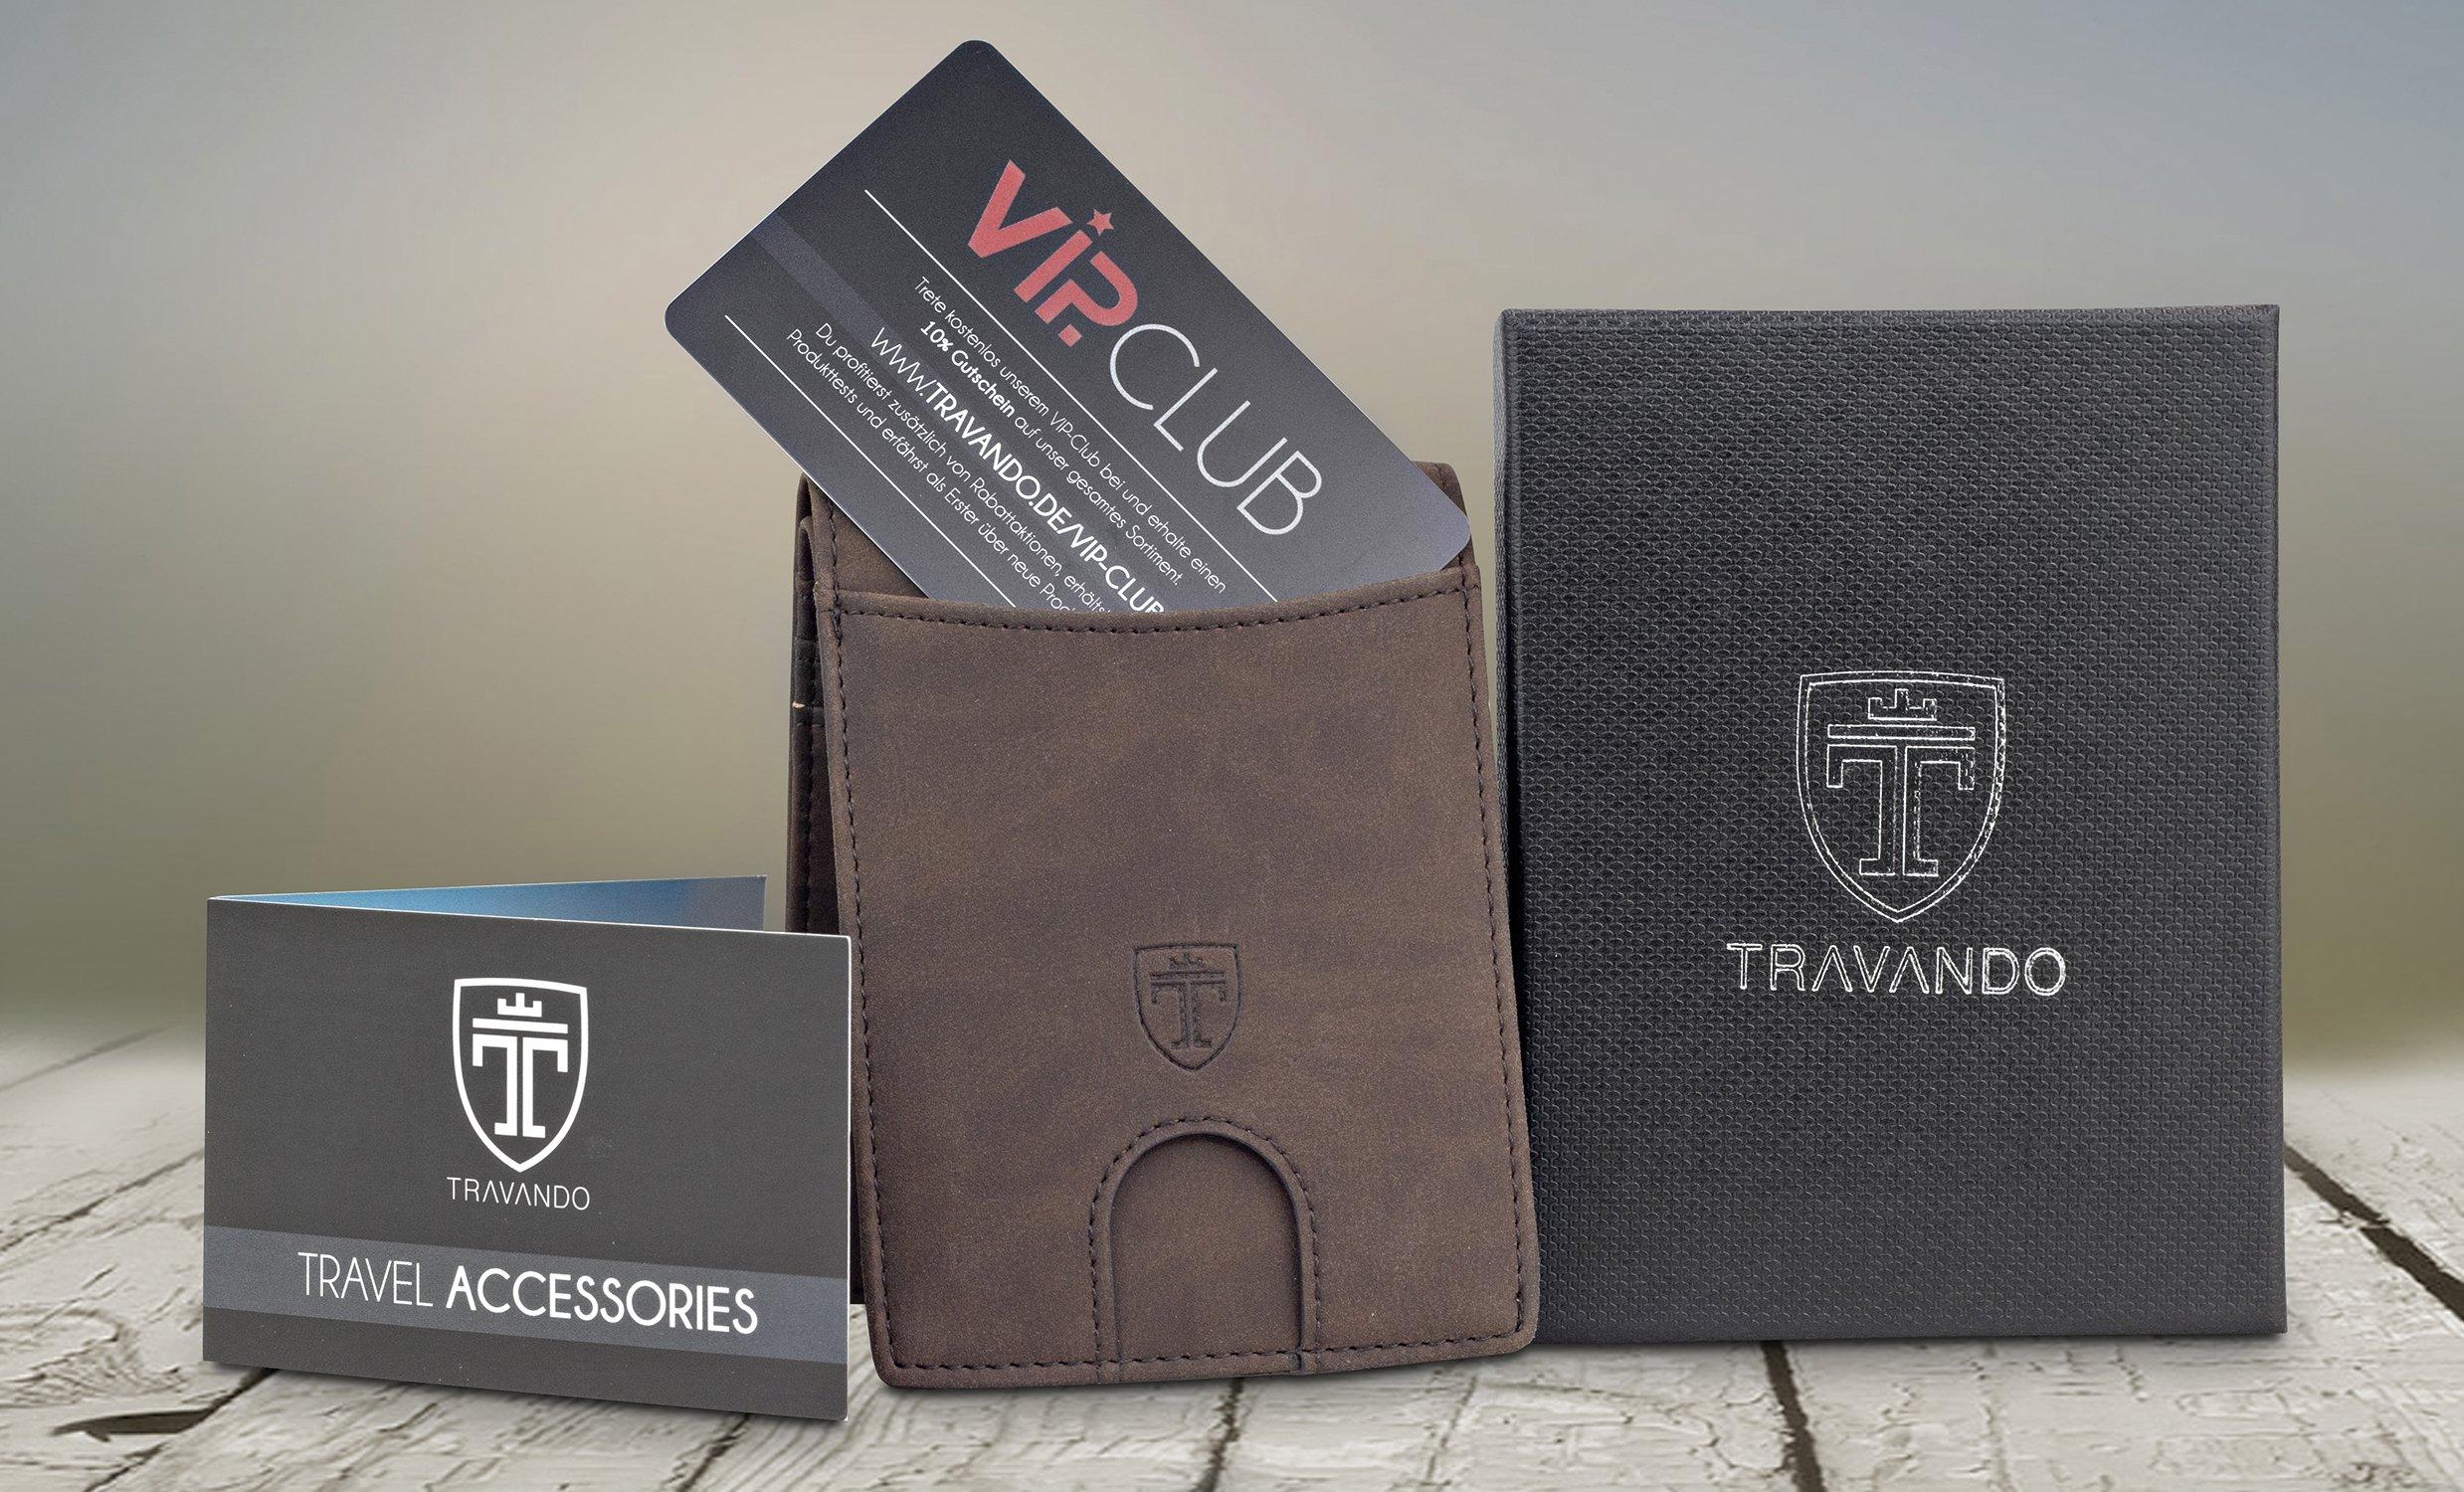 TRAVANDO Slim Wallets BUFFALO - RFID Blocking Wallet - 8 Card Pockets - Mini Credit Card Holder - Travel Wallet - Minimalist Bifold Wallet for Men with Gift Box by Travando (Image #7)